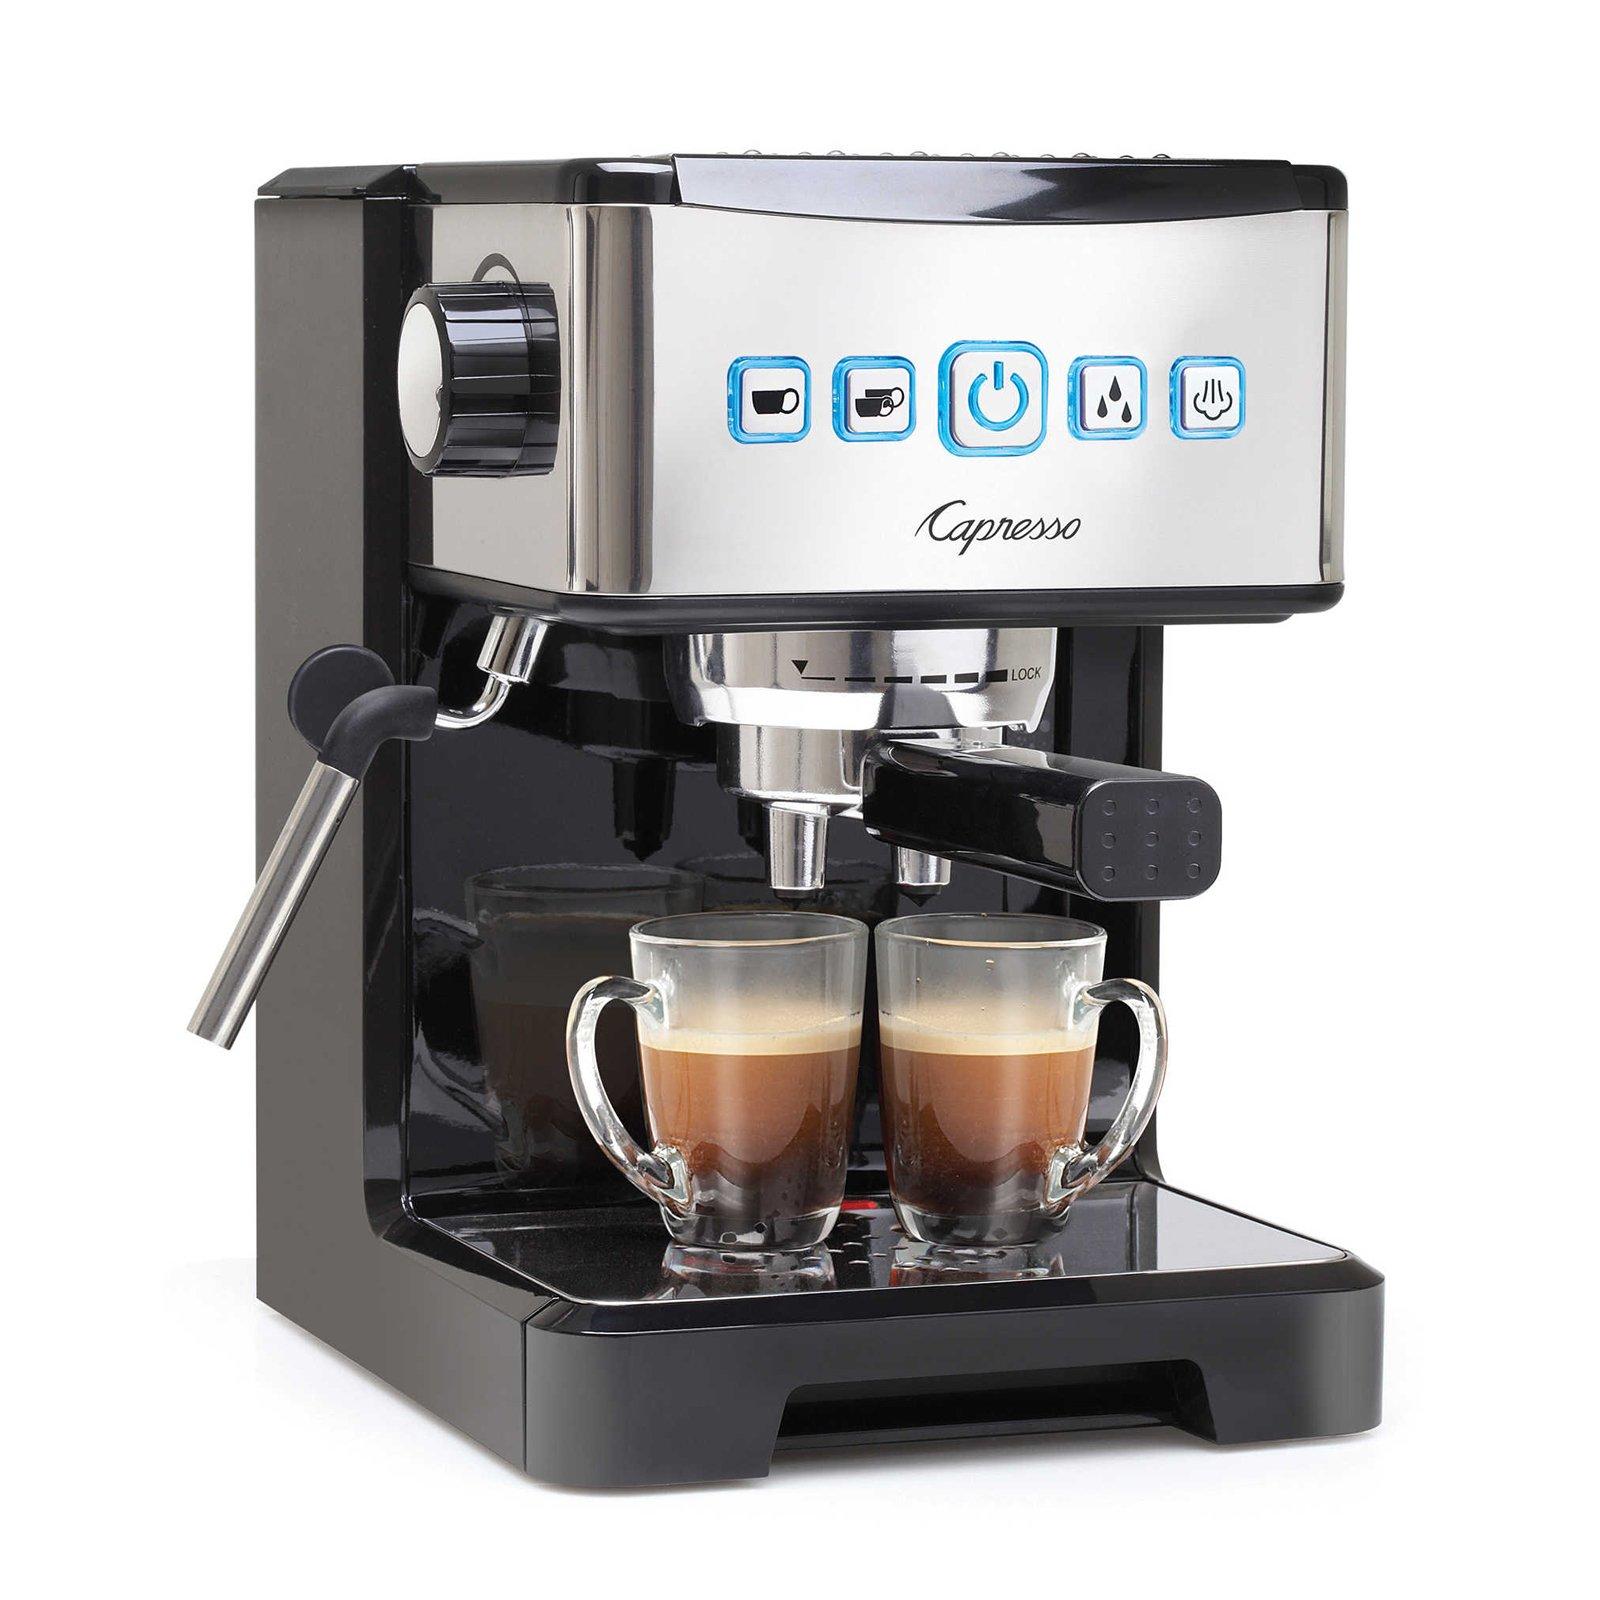 Capresso Ultima PRO Programmable Espresso & Cappuccino Maker Bundle (Certified Refurbished) by Capresso (Image #2)